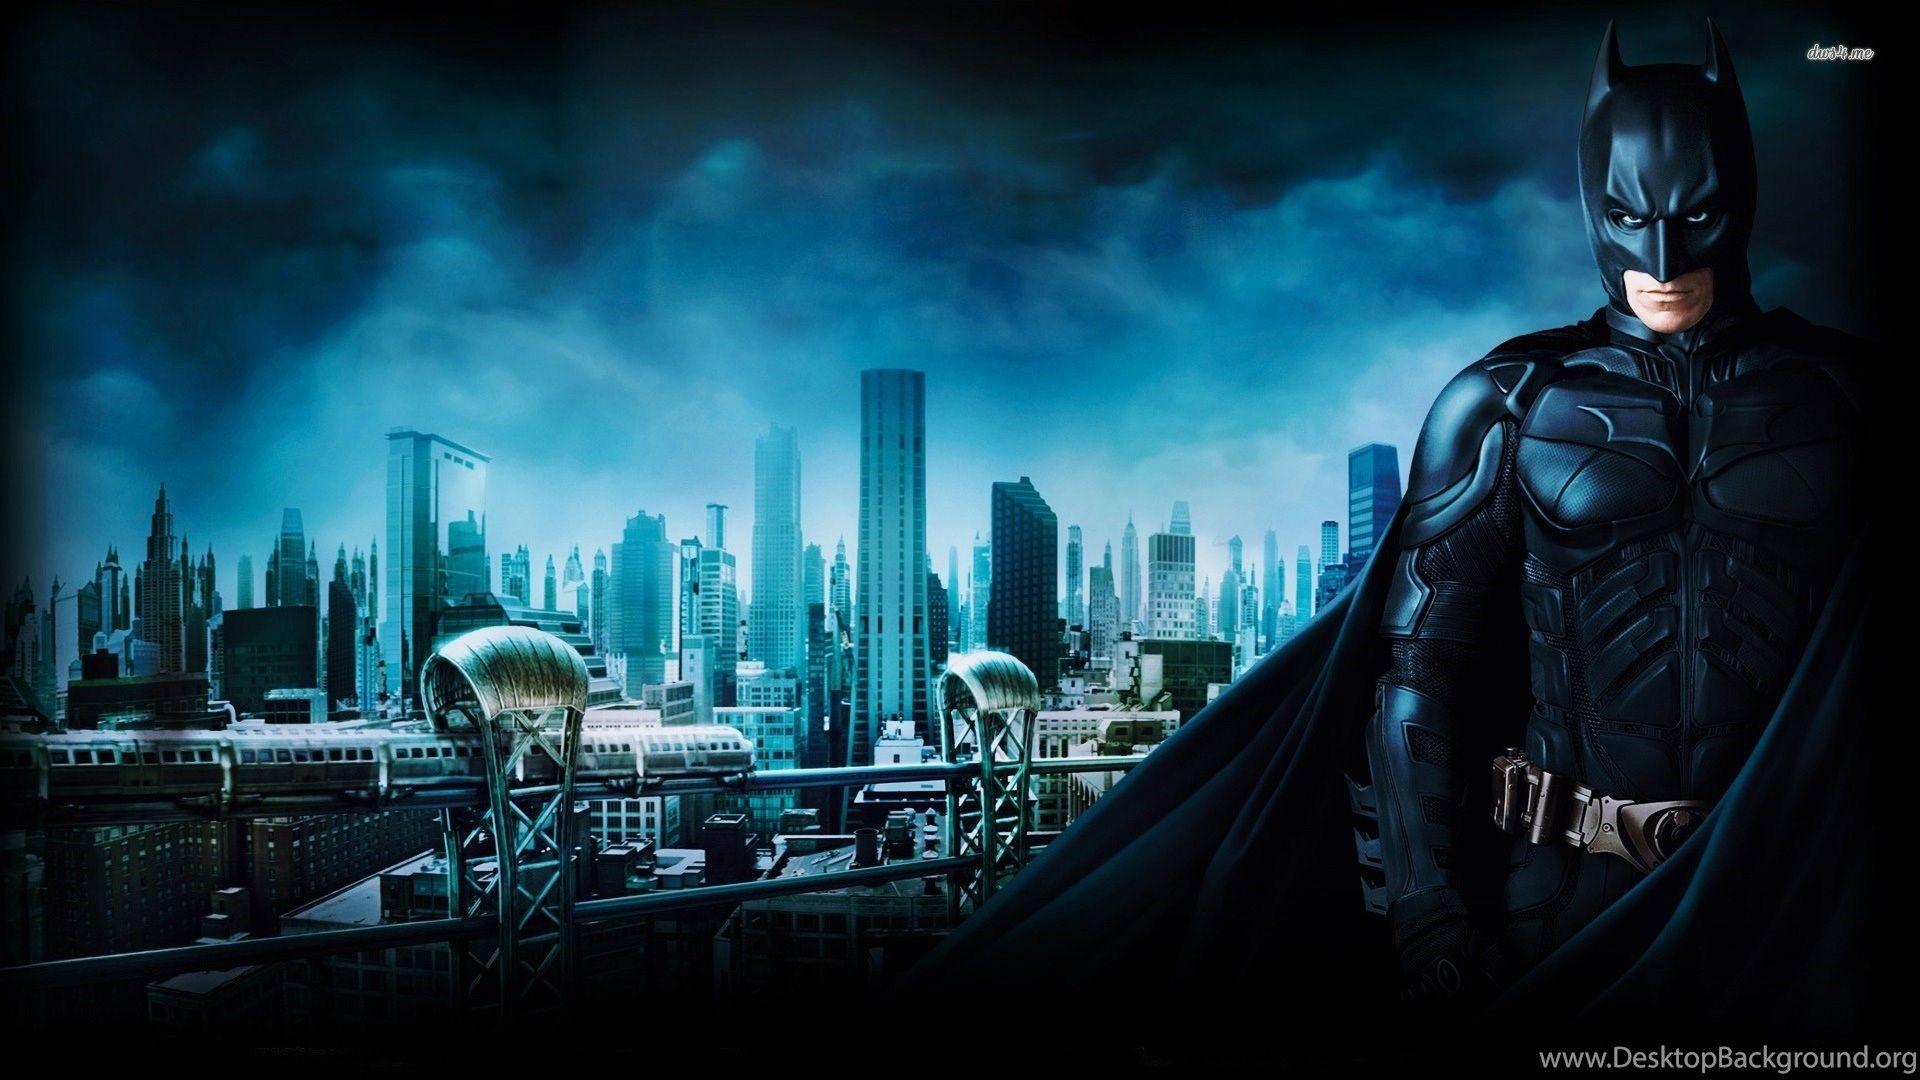 Batman 3d Wallpapers 1080p Flip Wallpapers Download Free Wallpaper Hd Batman Batman Begins Full Movies Online Free